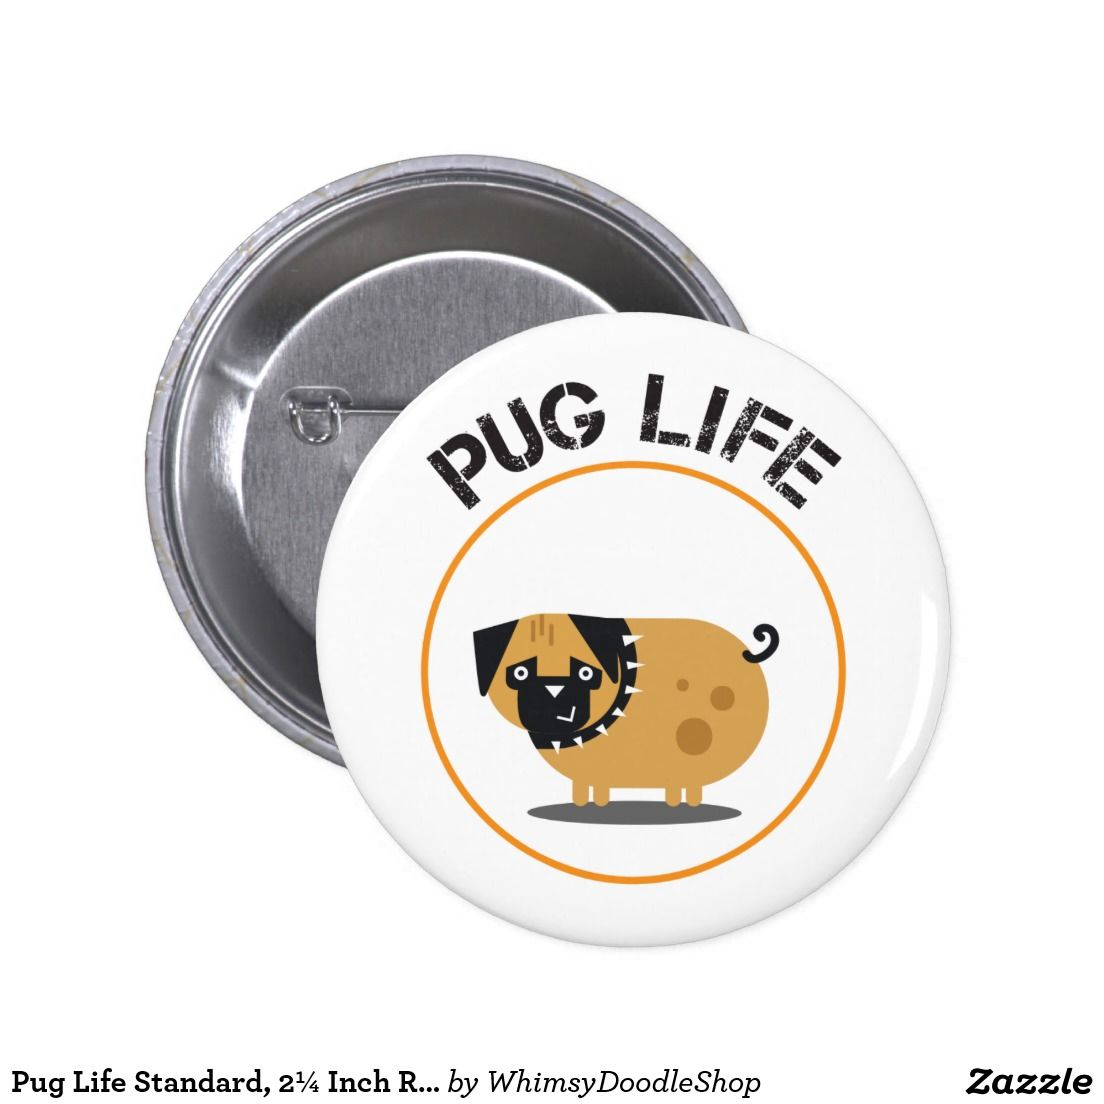 Pug Life Standard, 2¼ Inch Round Button